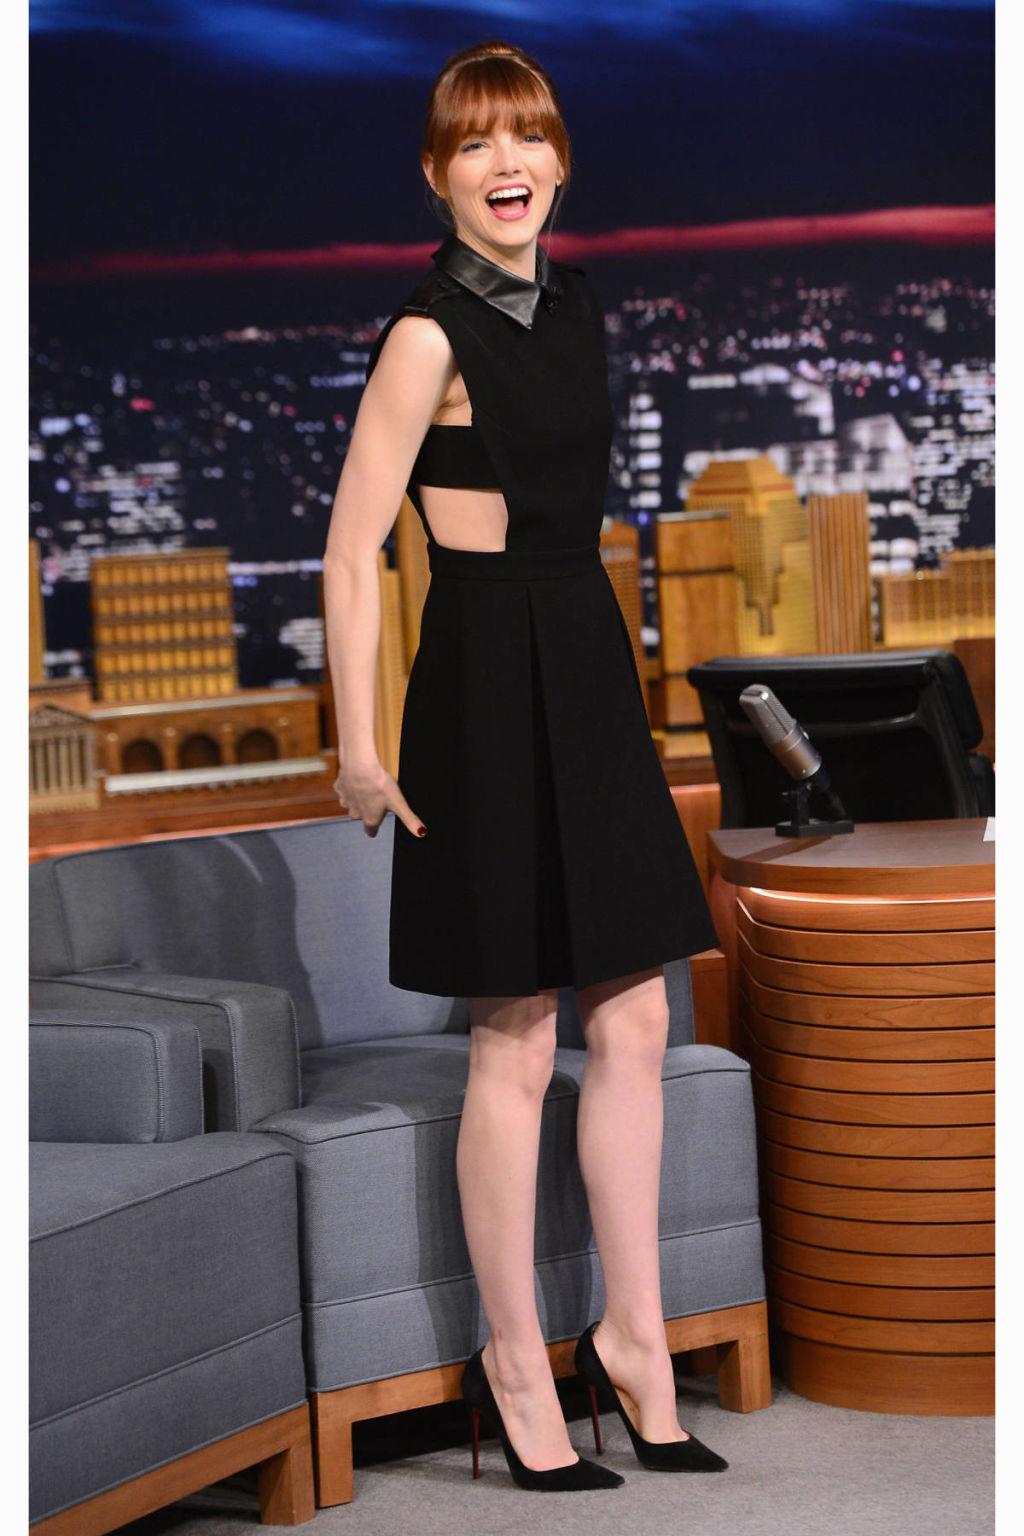 Emma Stone Spider-Man 2 Style - Emma Stone Red Carpet Looks Emma Stone Red Carpet Style